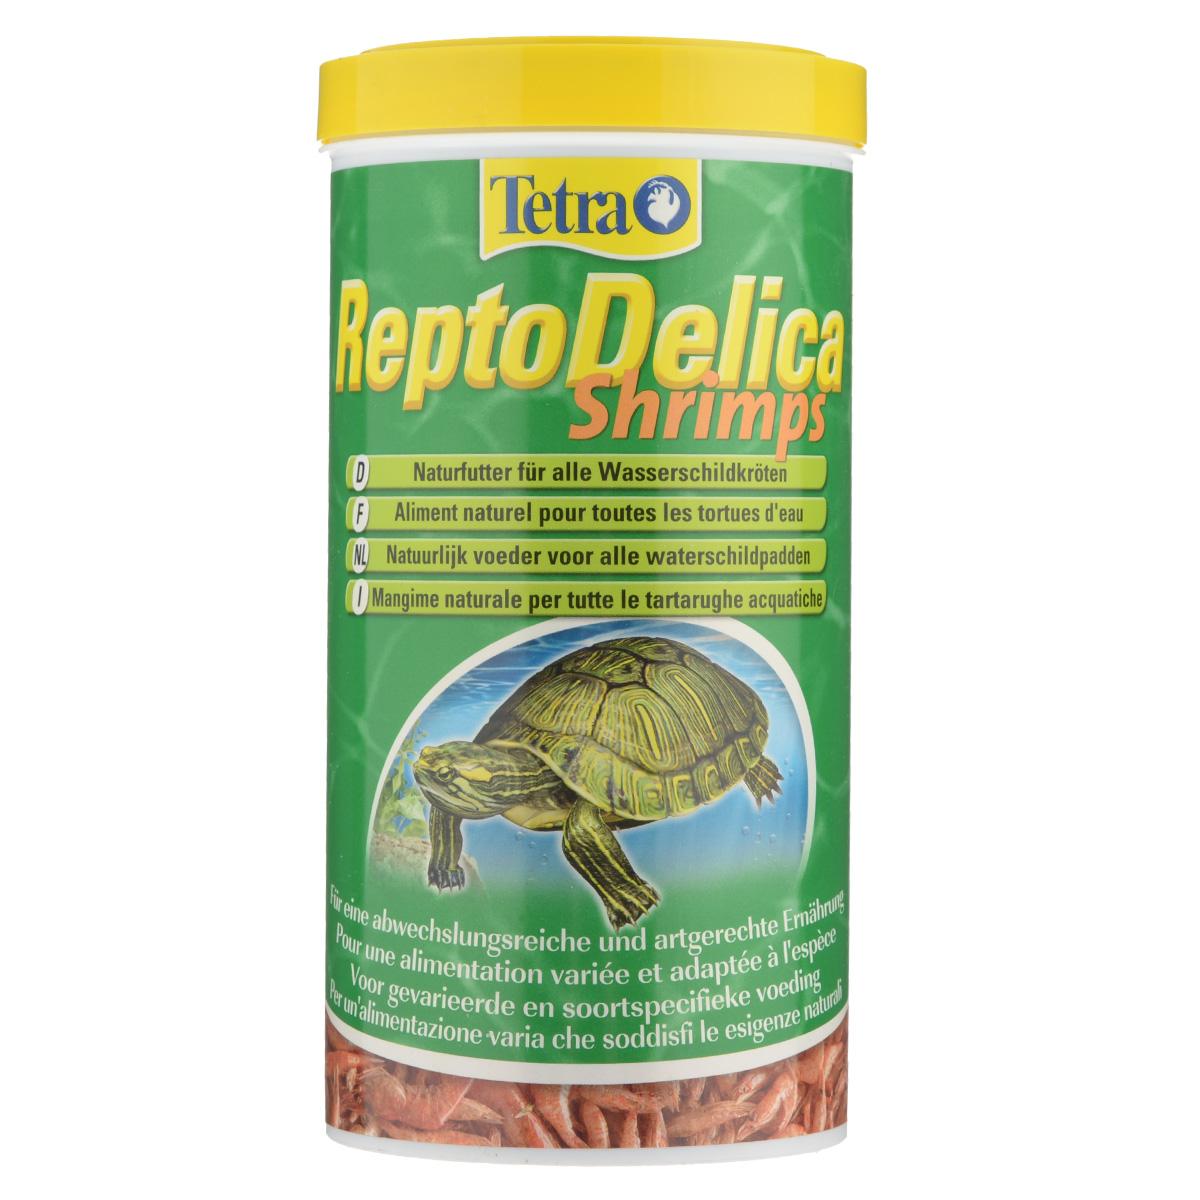 Корм-лакомство для водных черепах Tetra ReptoDelica Shrimps, креветки, 1 л корм tetra reptodelica shrimps natural food for all water turtles креветки для всех видов водных черепах 1л